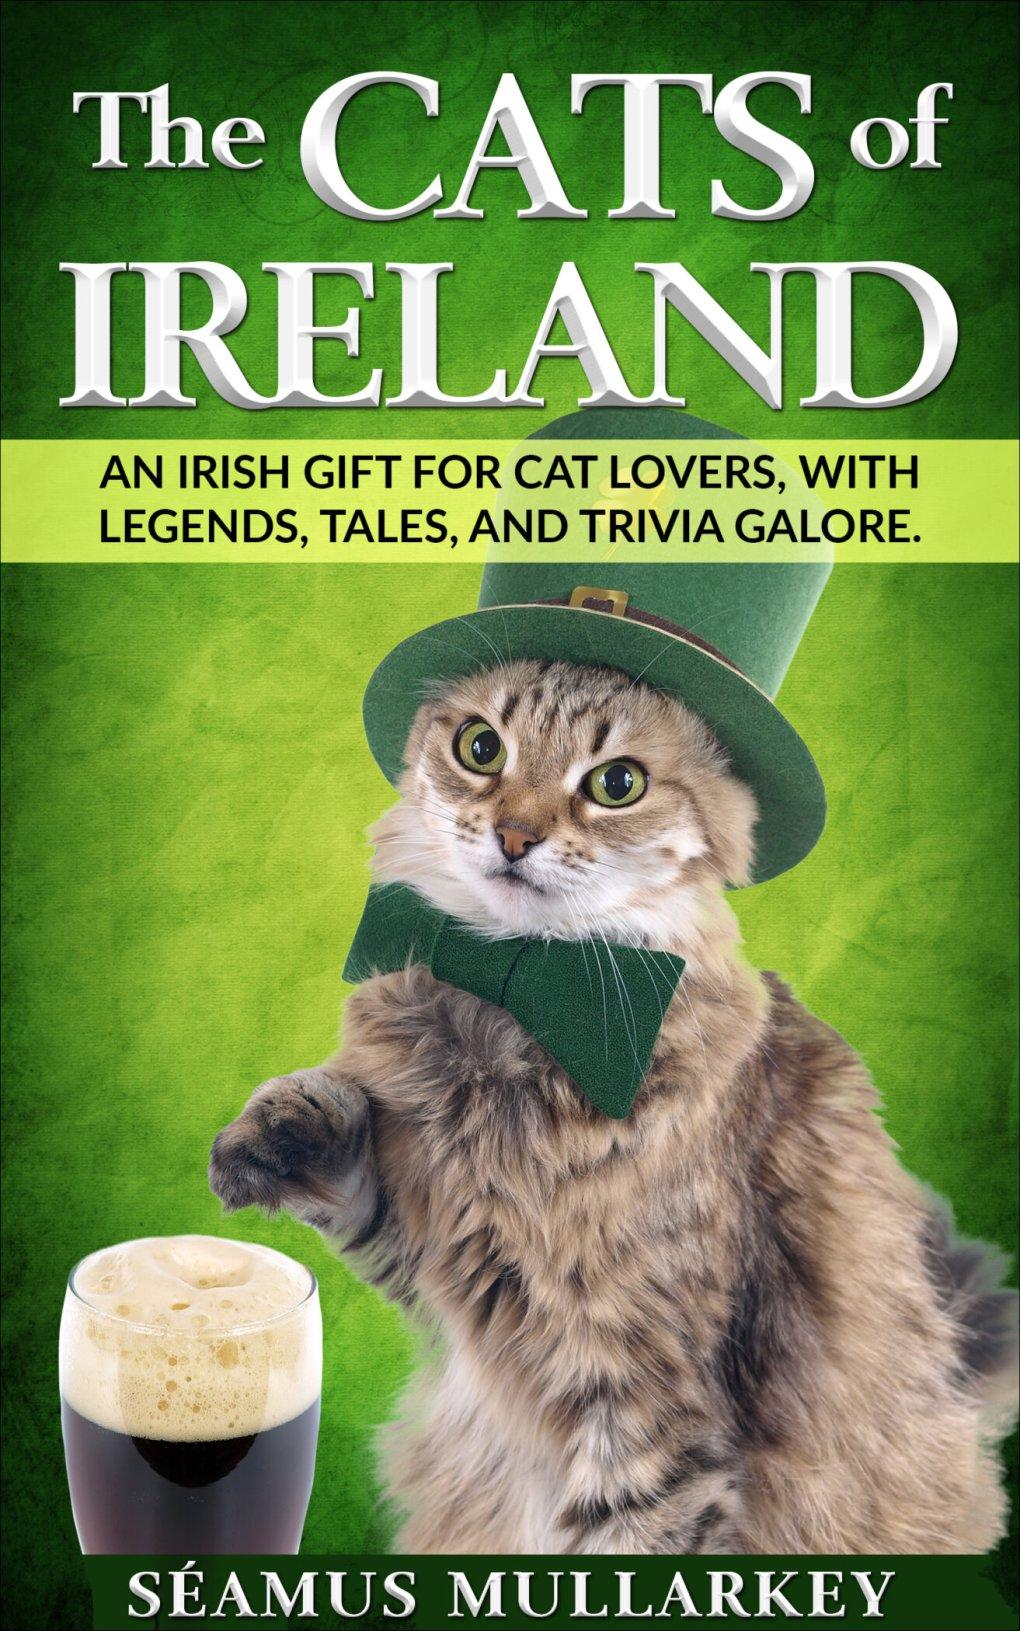 The Cats of Ireland